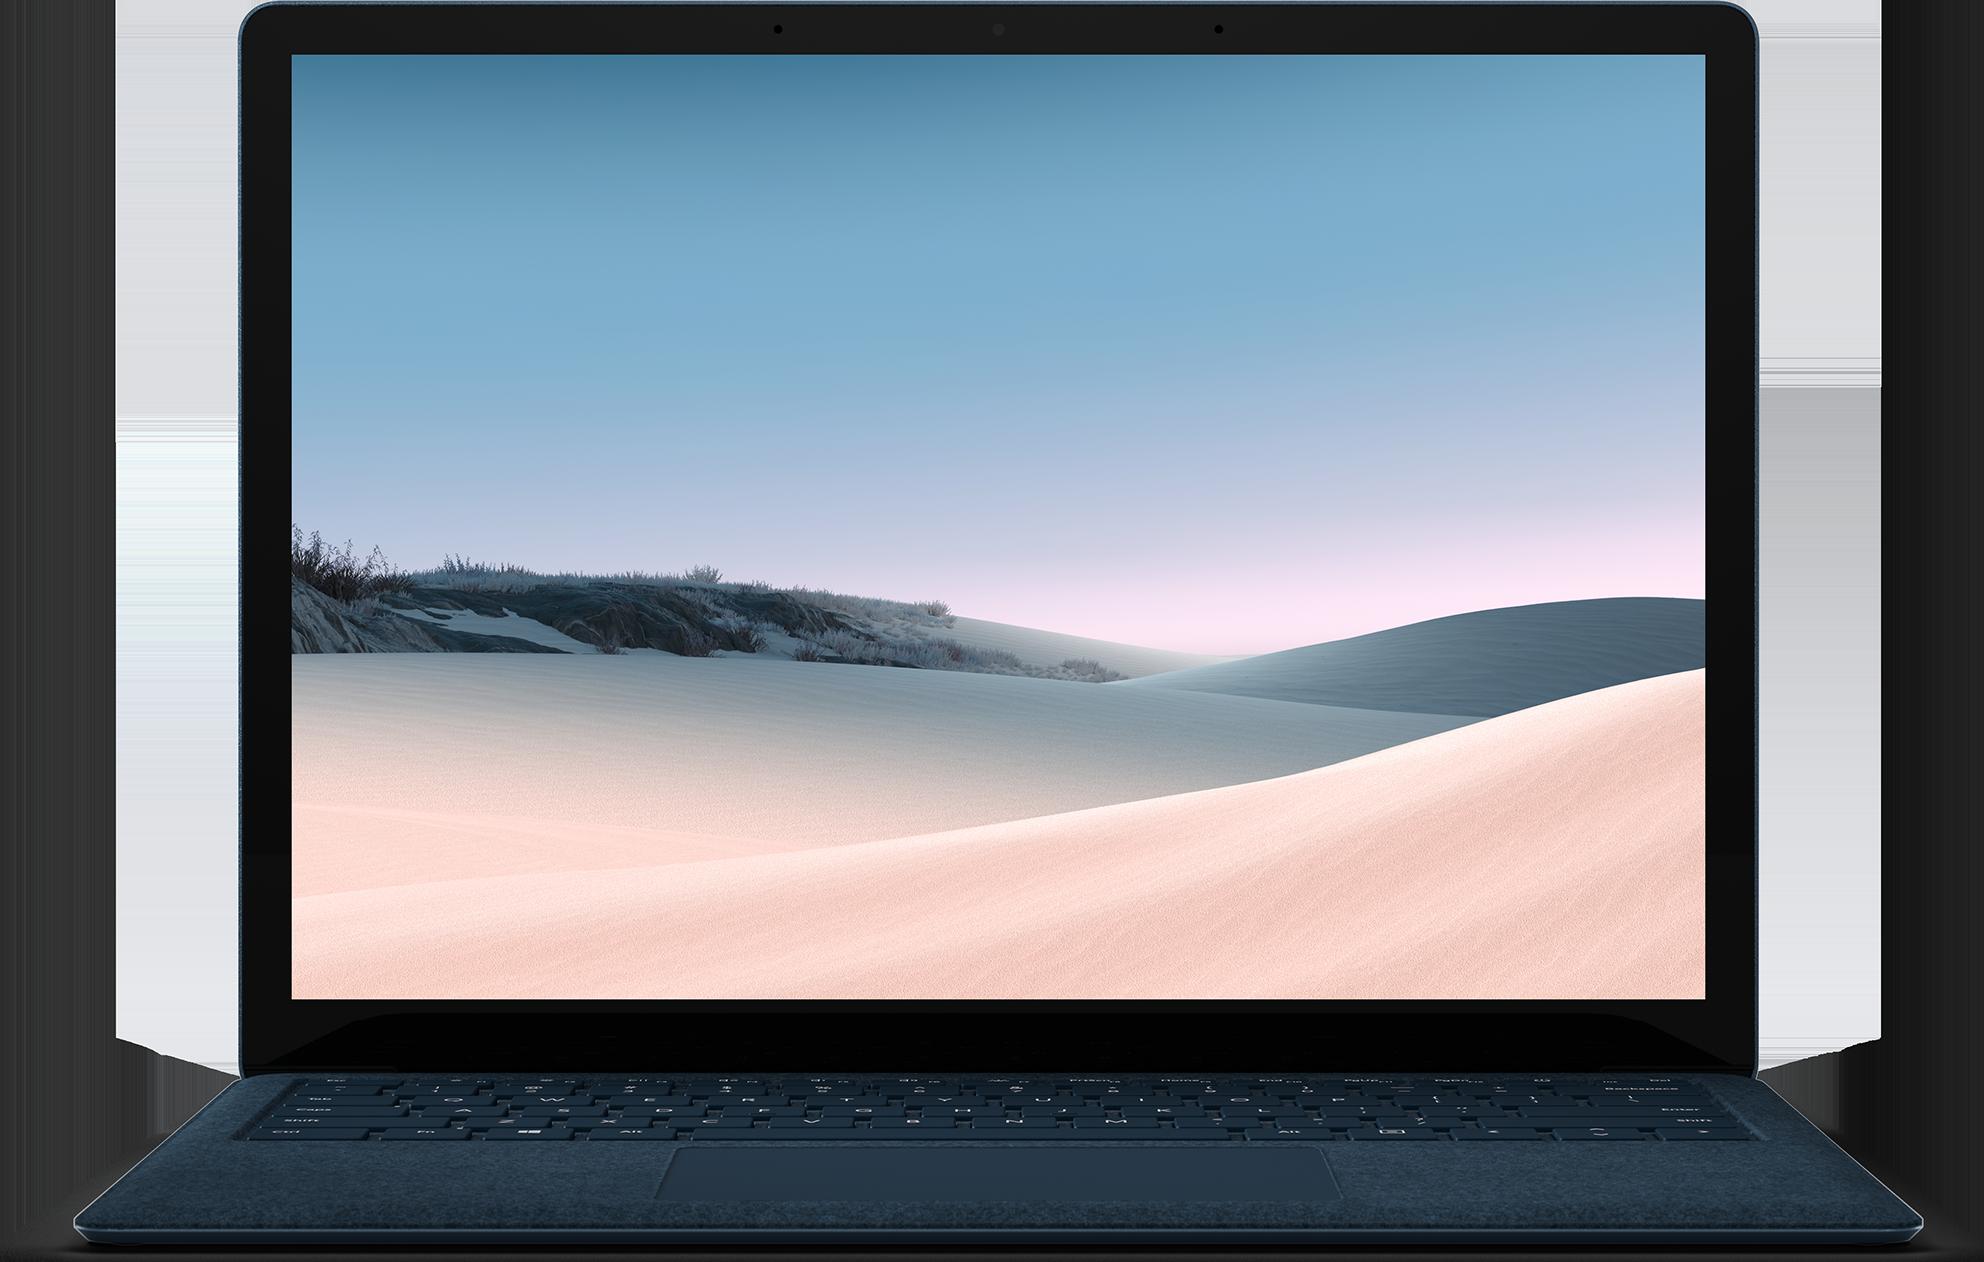 Surface Laptop 3 for Business - 13.5 inch, Cobalt Blue (Alcantara®), Intel Core i5, 16GB, 256GB